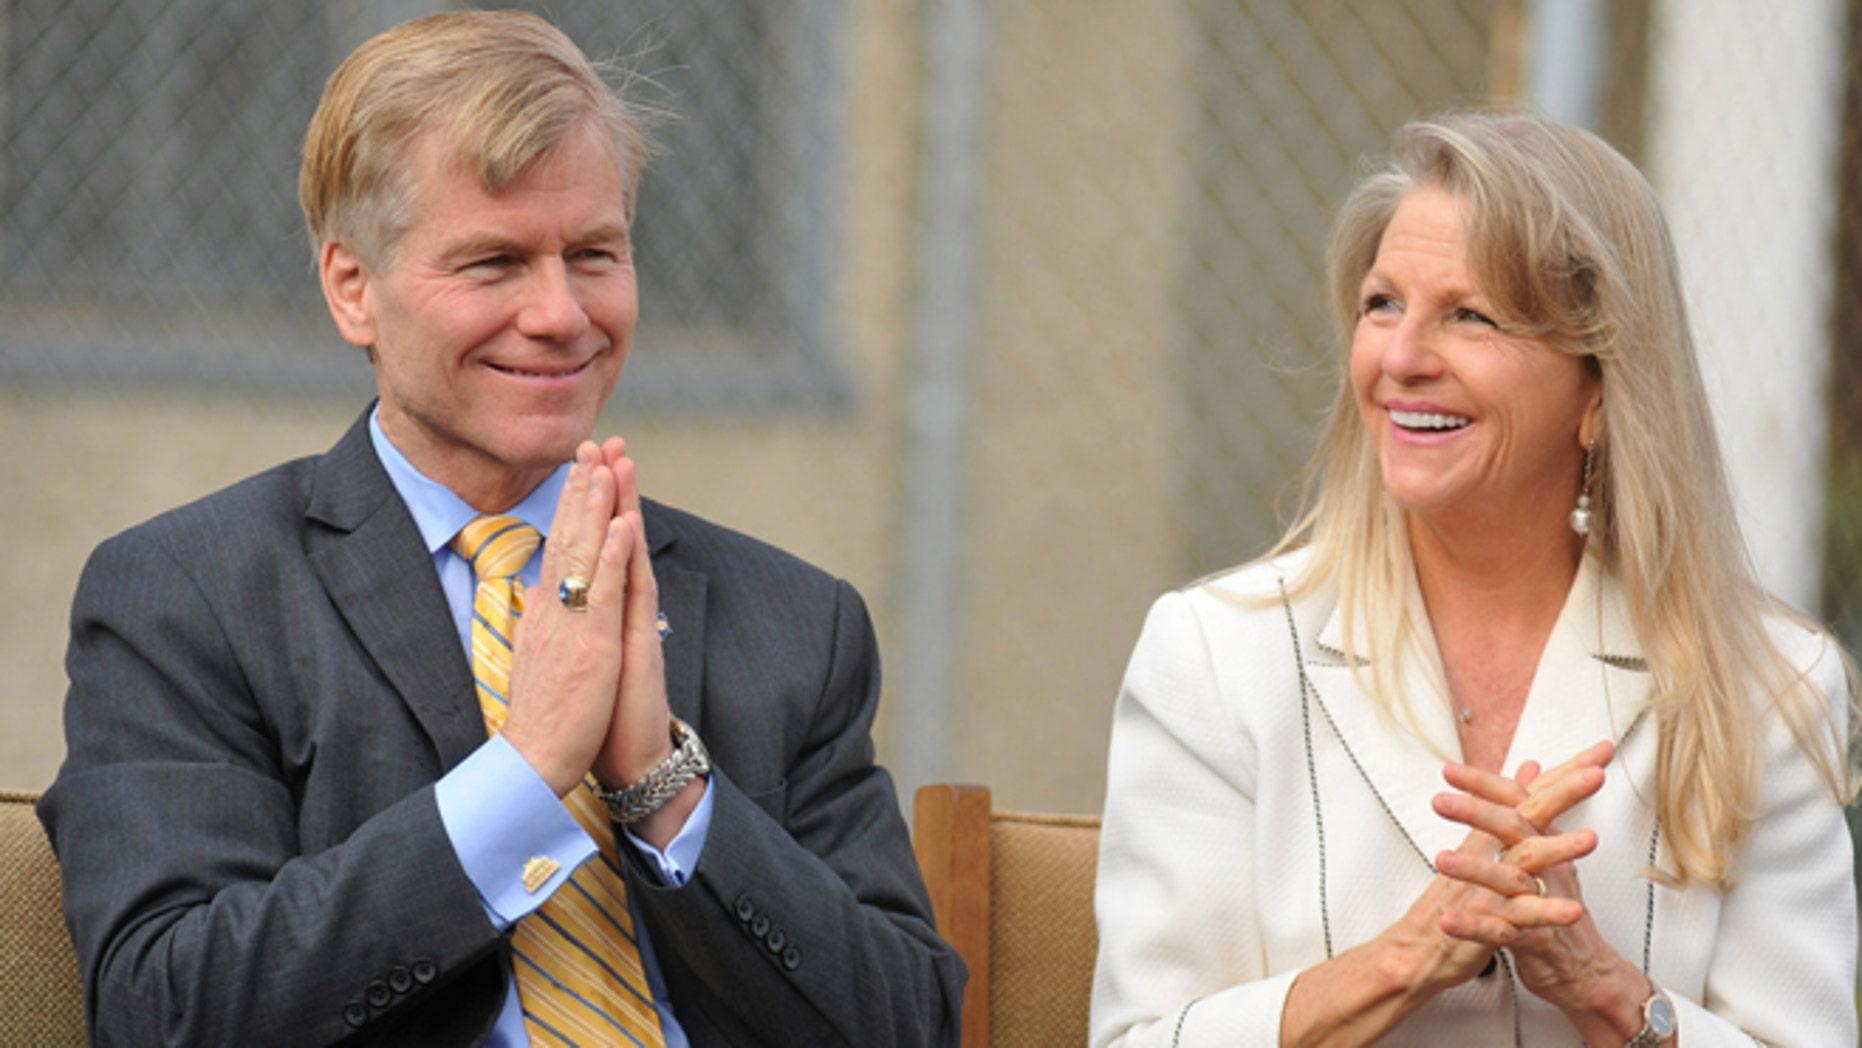 FILE: Oct. 22, 2013: Then-Virginia Gov. Bob McDonnell and wife Maureen at Saint Joseph School in Petersburg, Va.